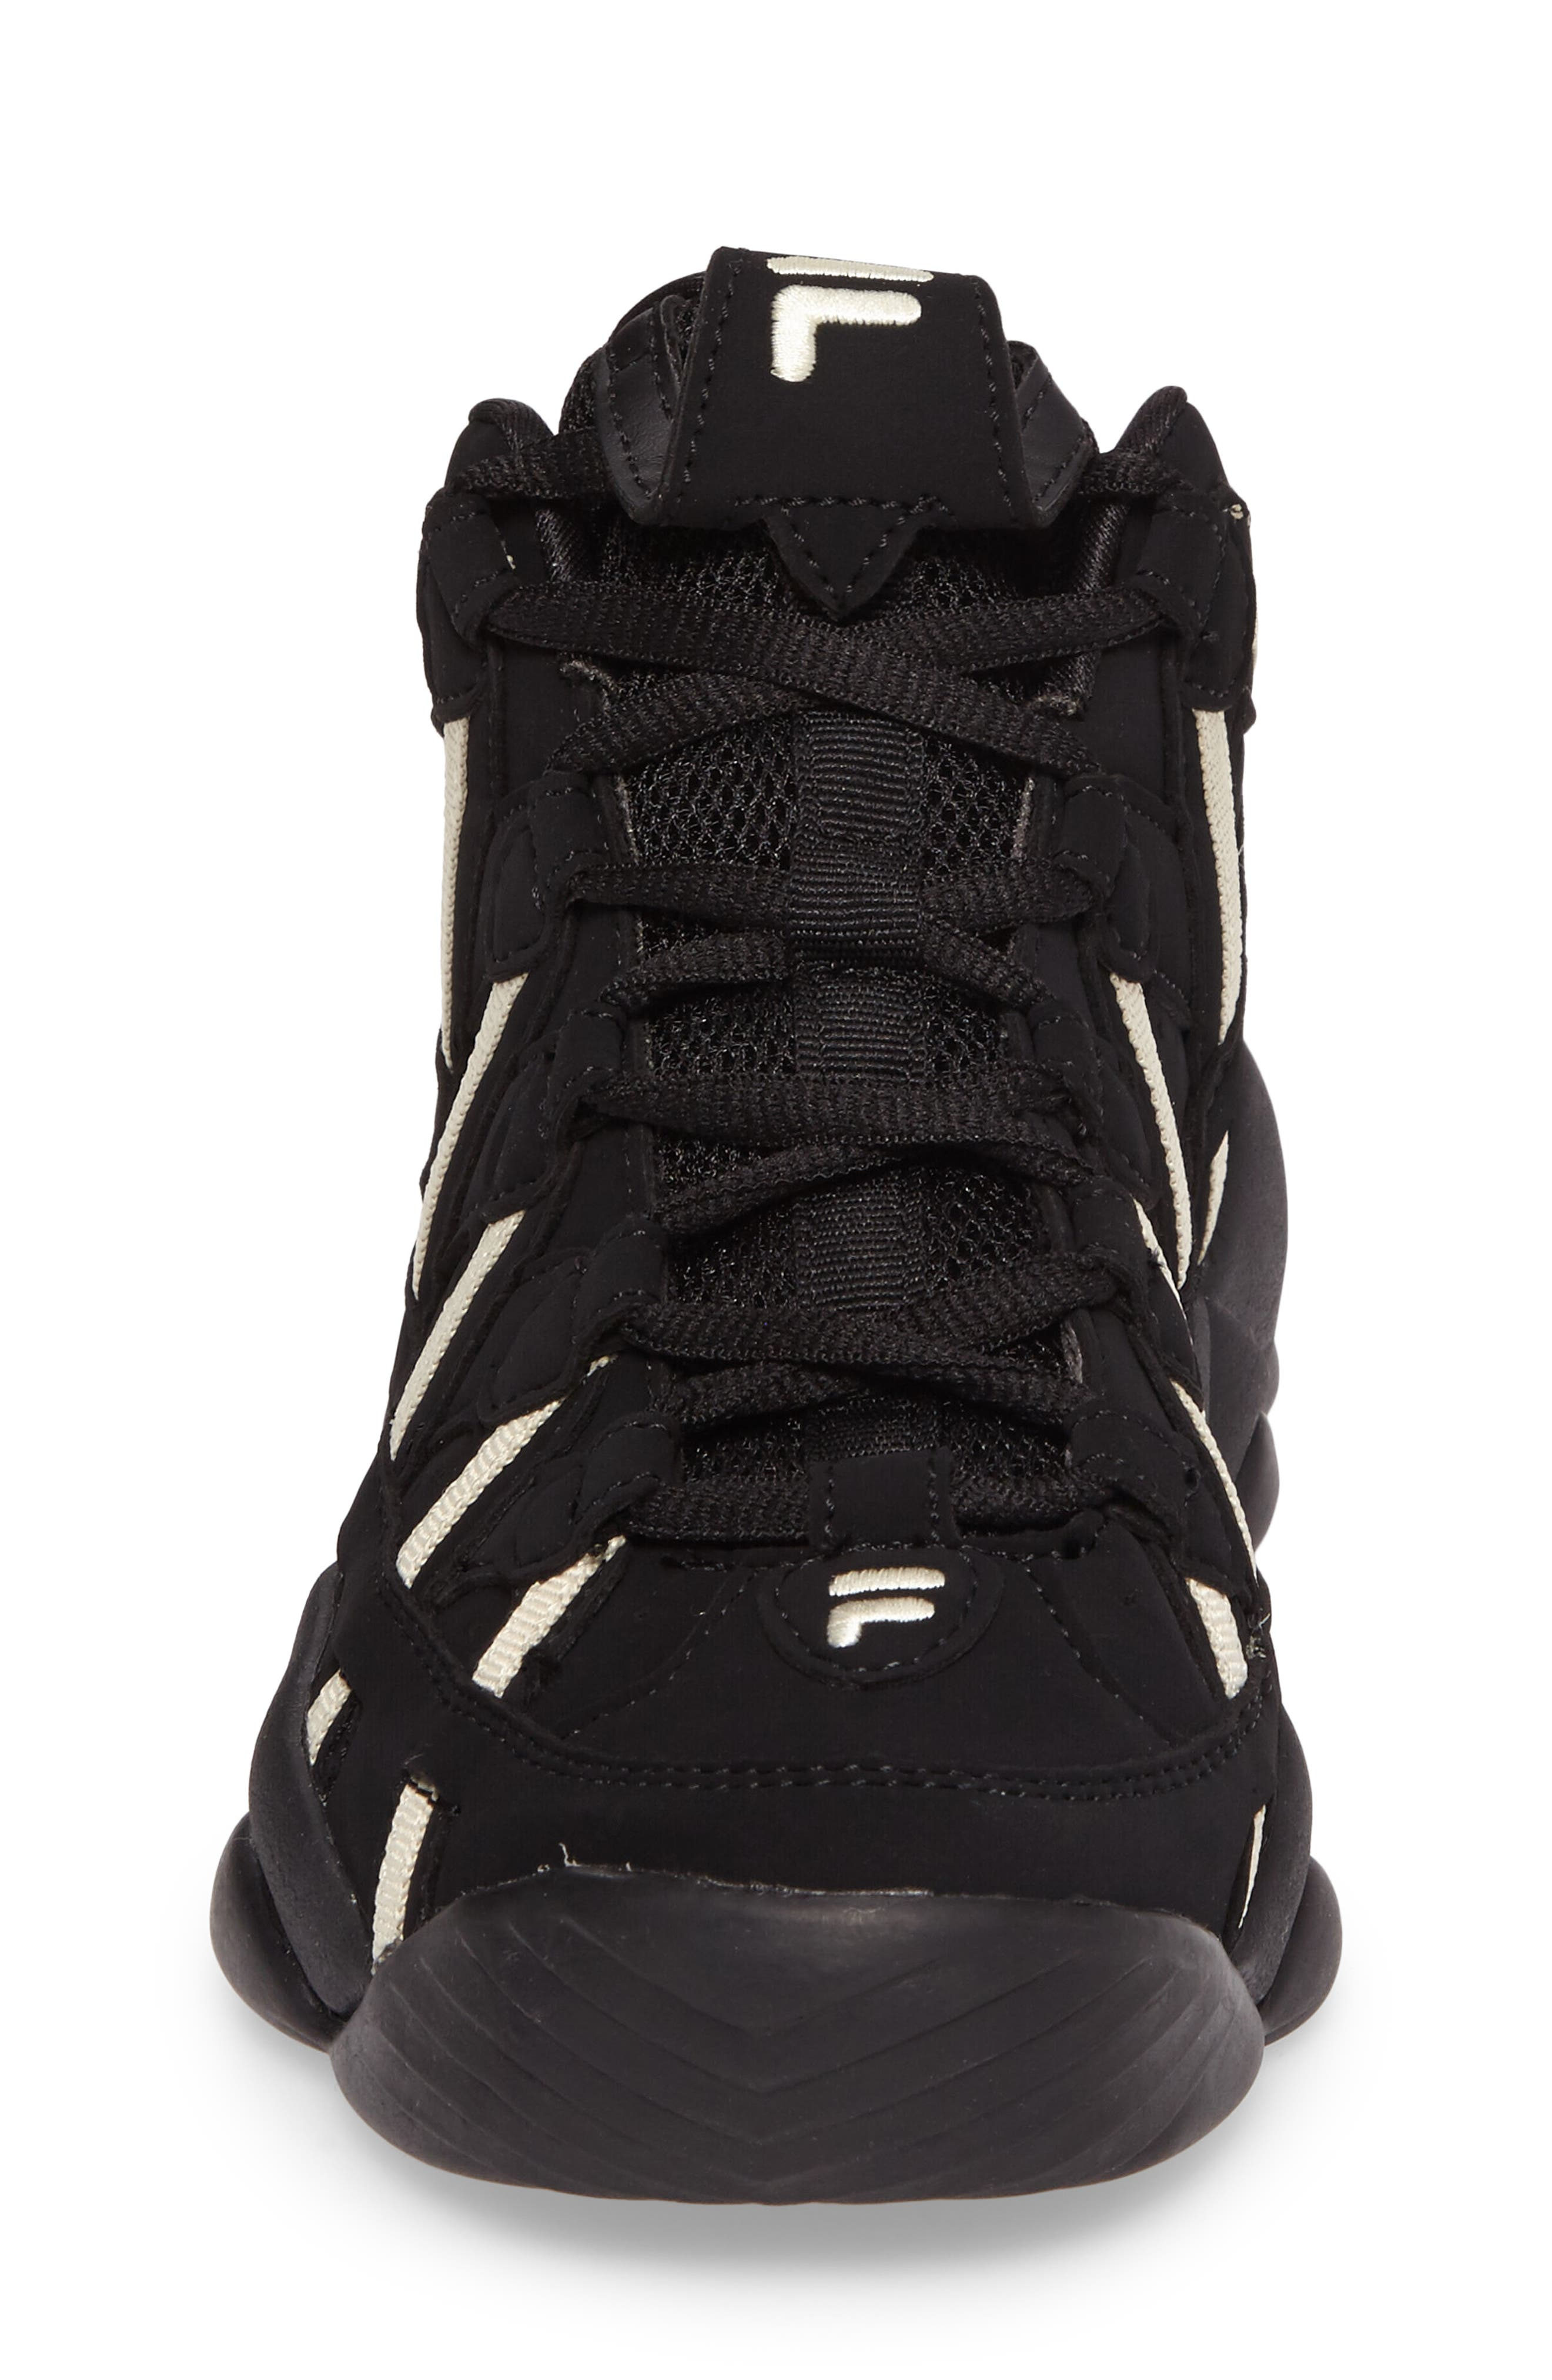 Spaghetti Deluxe Mid Top Sneaker,                             Alternate thumbnail 4, color,                             Black/ Cream